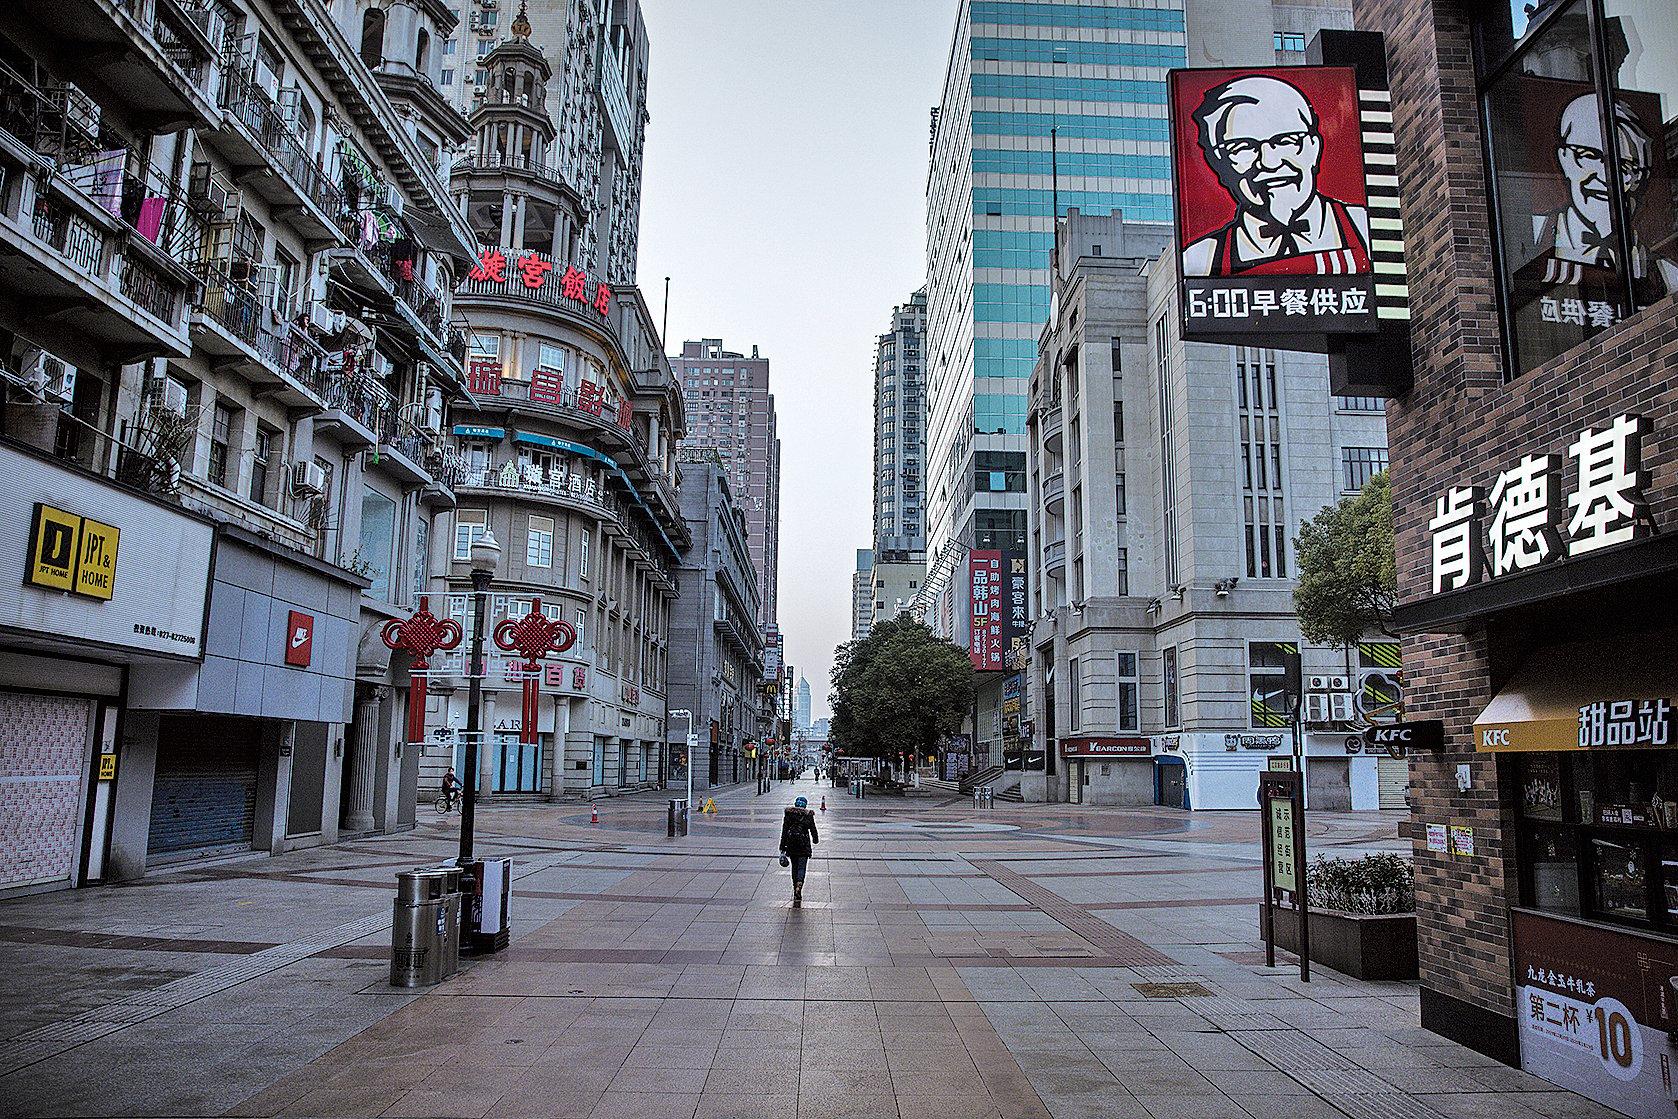 2020年1月23日武漢封城後街上空蕩蕩。 (Stringer/Getty Images)